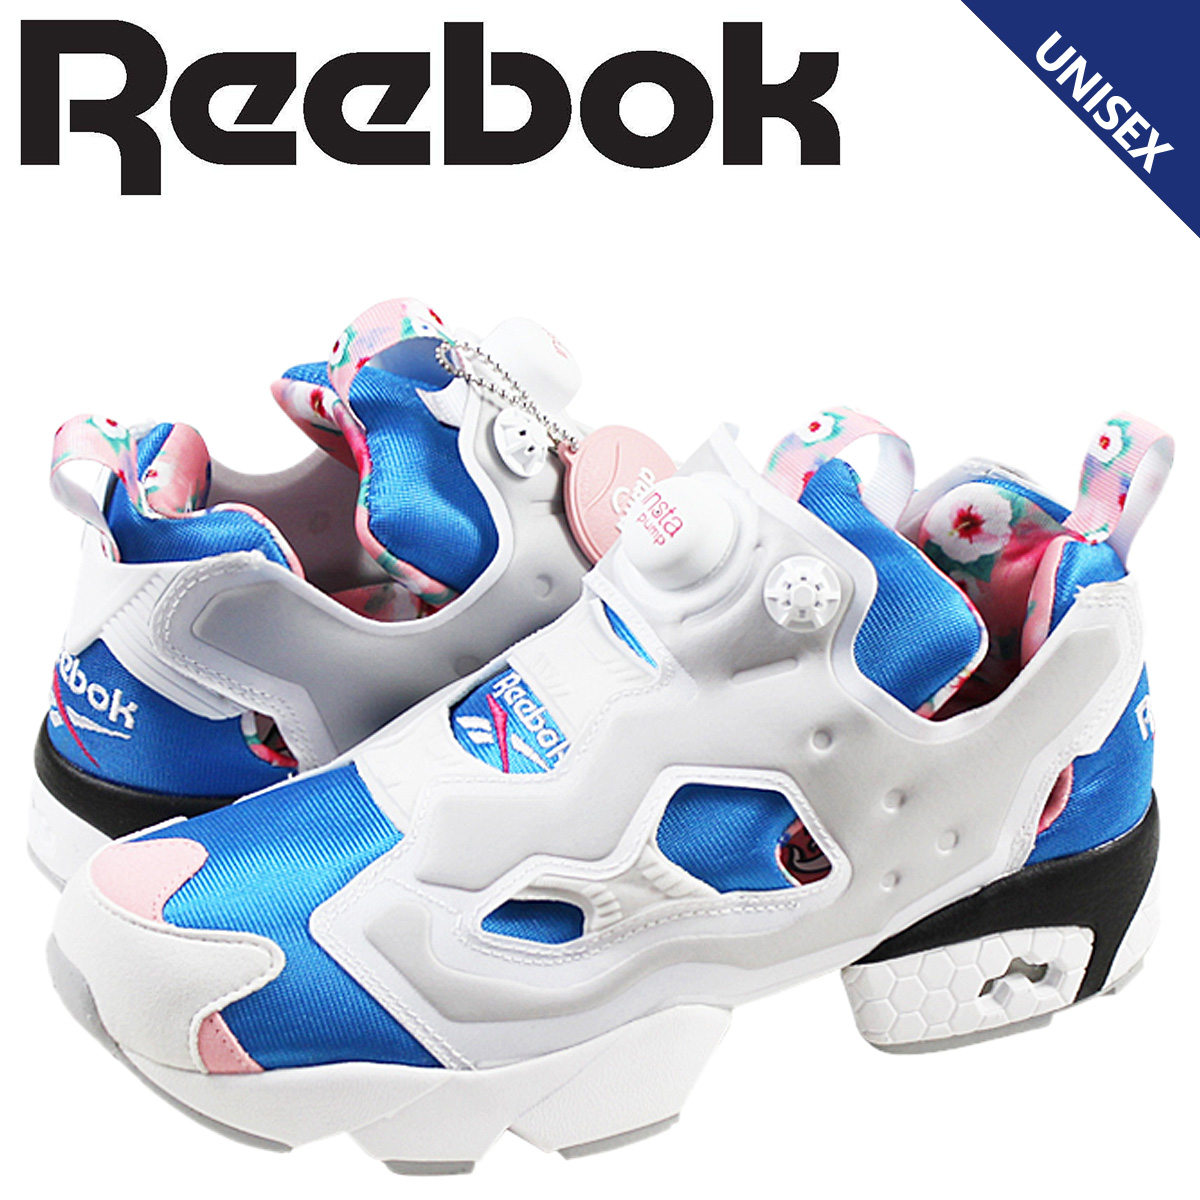 5e2bb9d4 ALLSPORTS: Reebok Reebok INSTA PUMP FURY OG sneaker insta pump fury ...